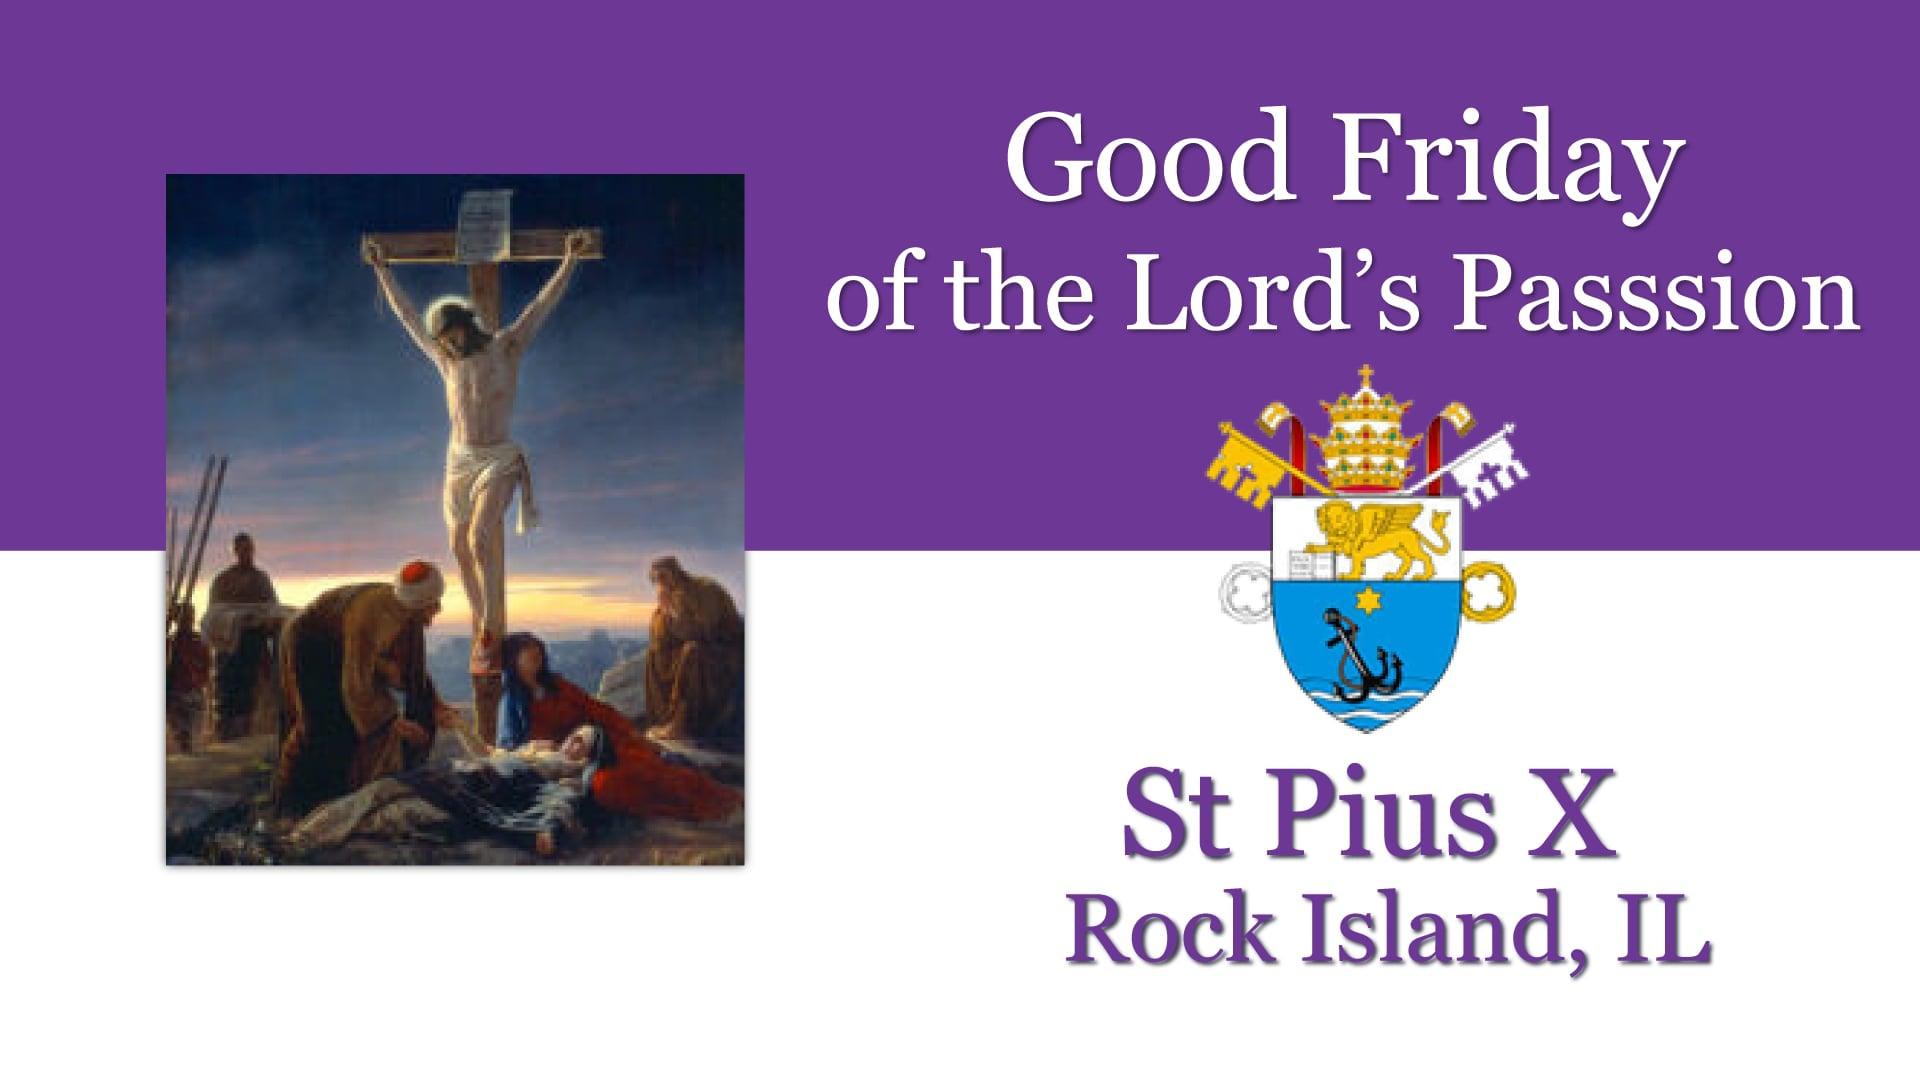 Good Friday, April 2nd, St Pius X, Rock Island